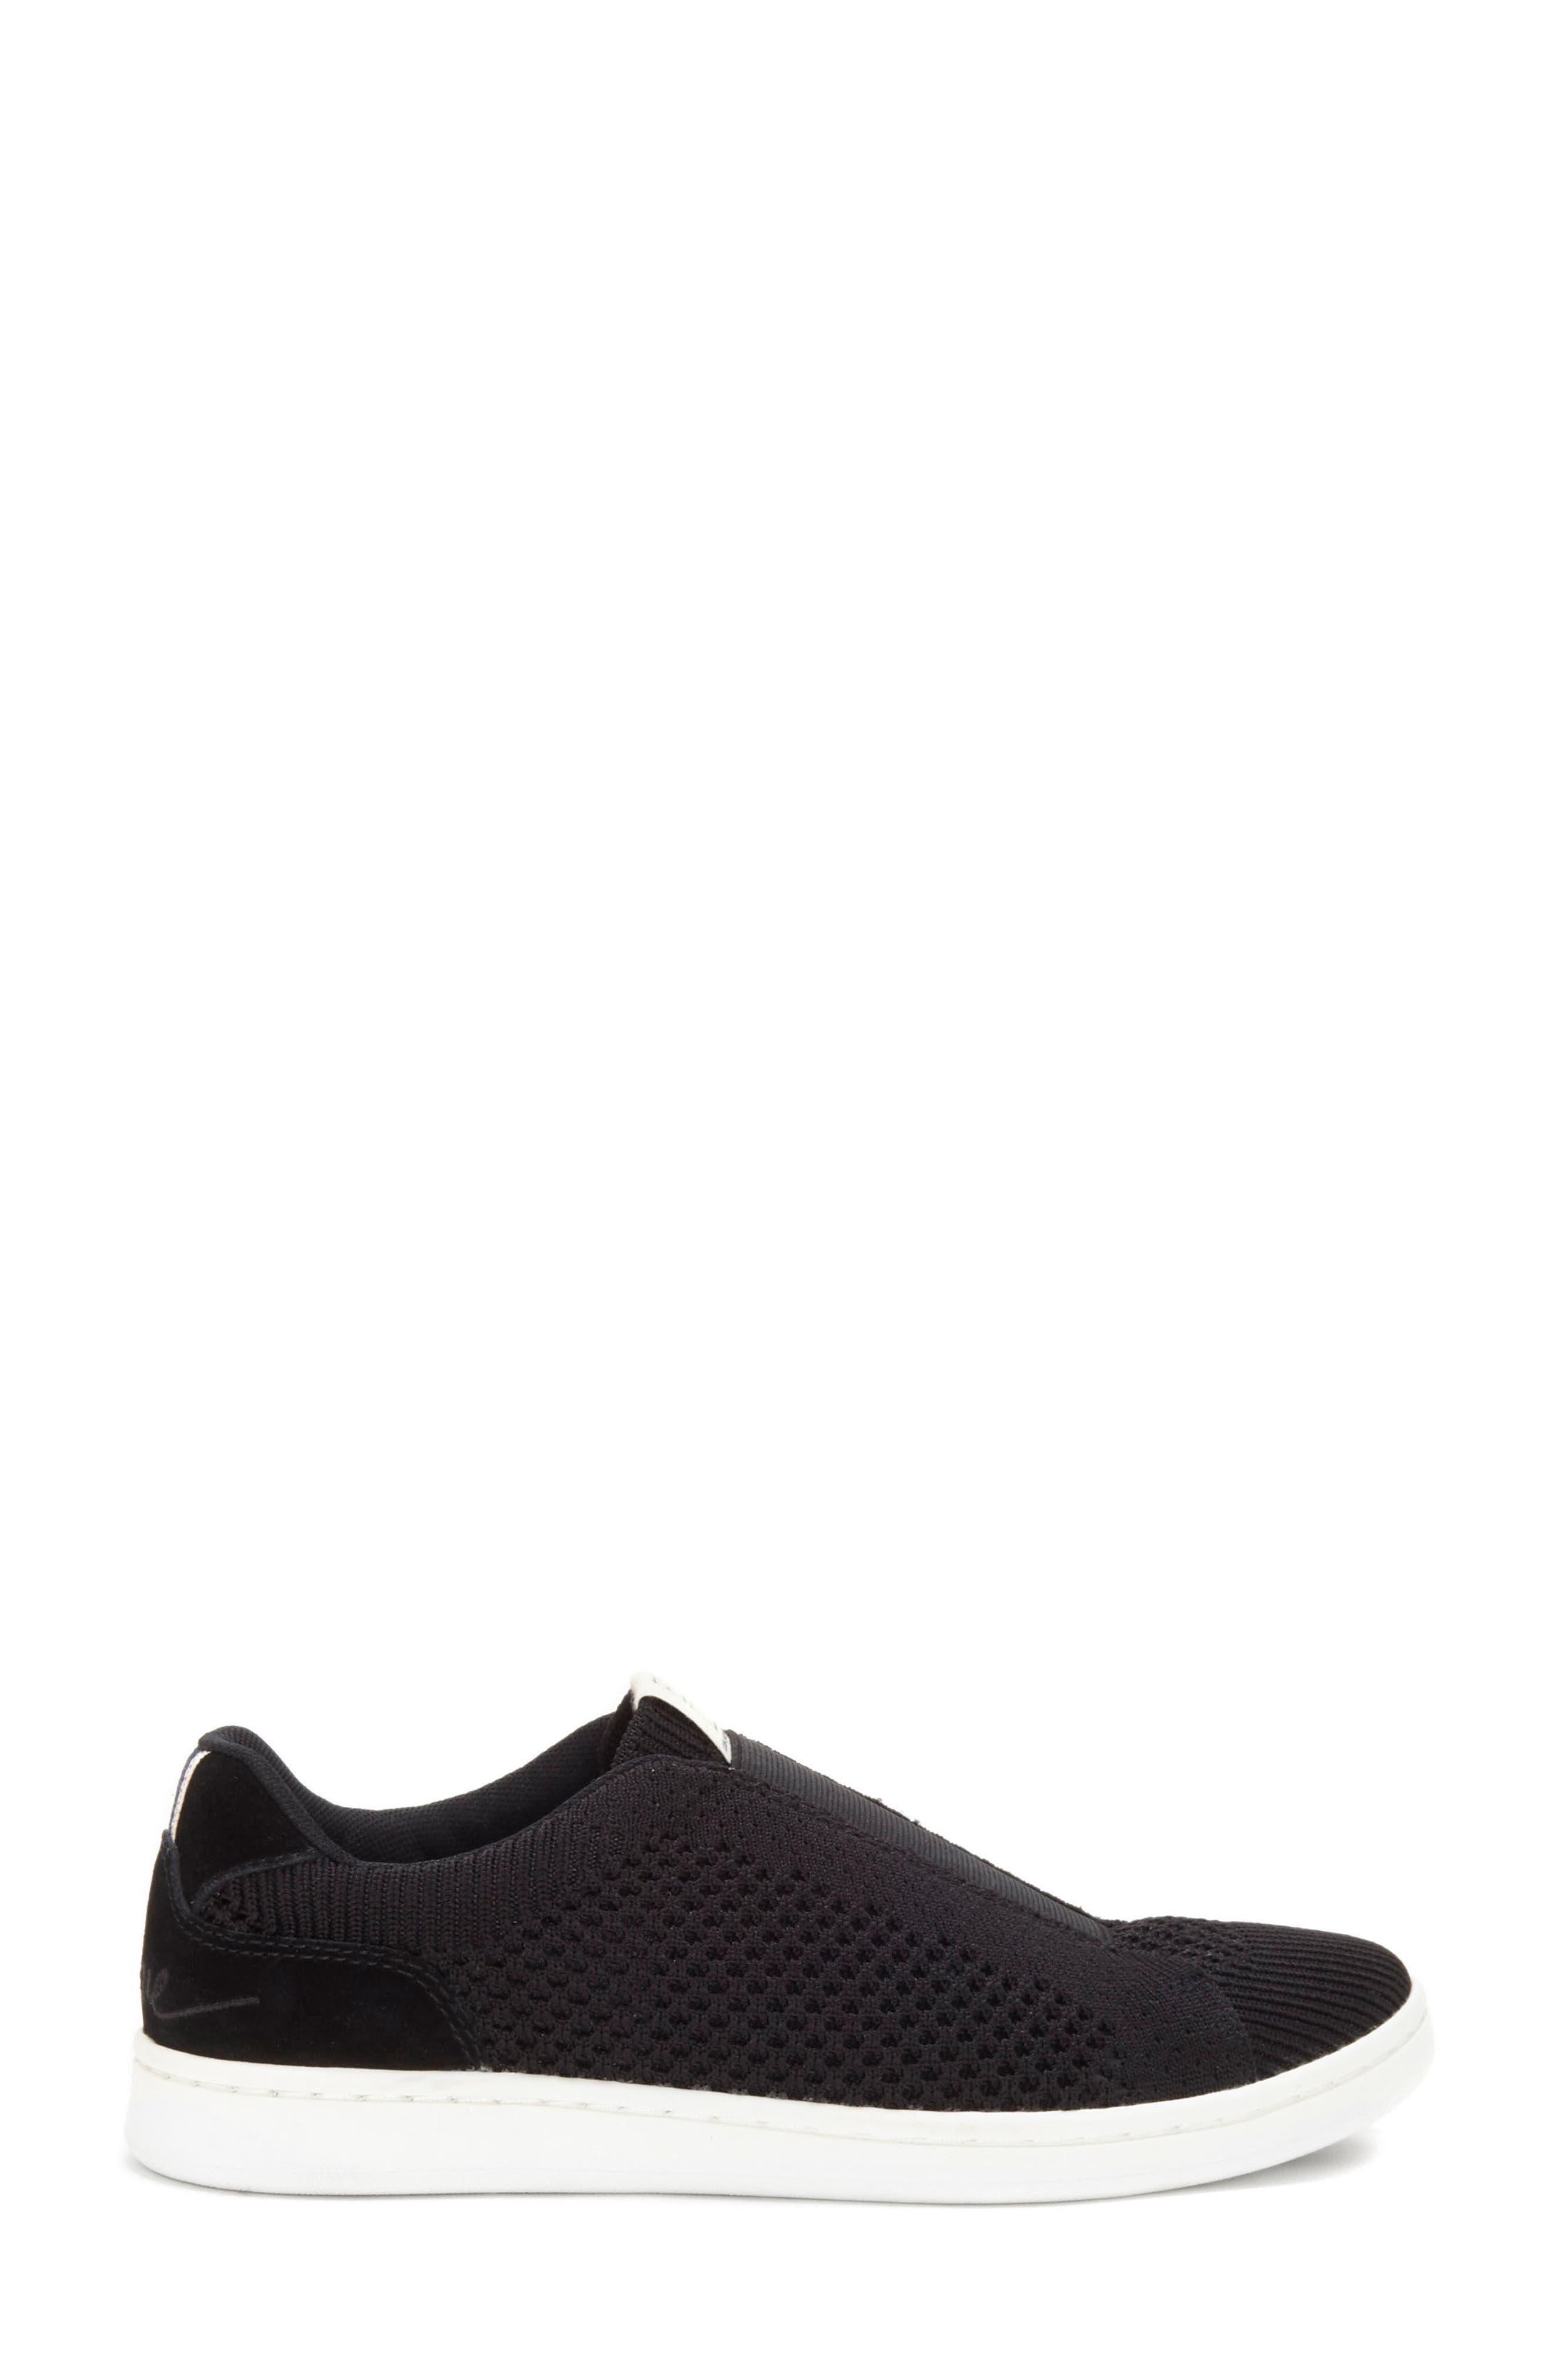 Casbey Slip-On Sneaker,                             Alternate thumbnail 3, color,                             BLACK/ BLACK FABRIC